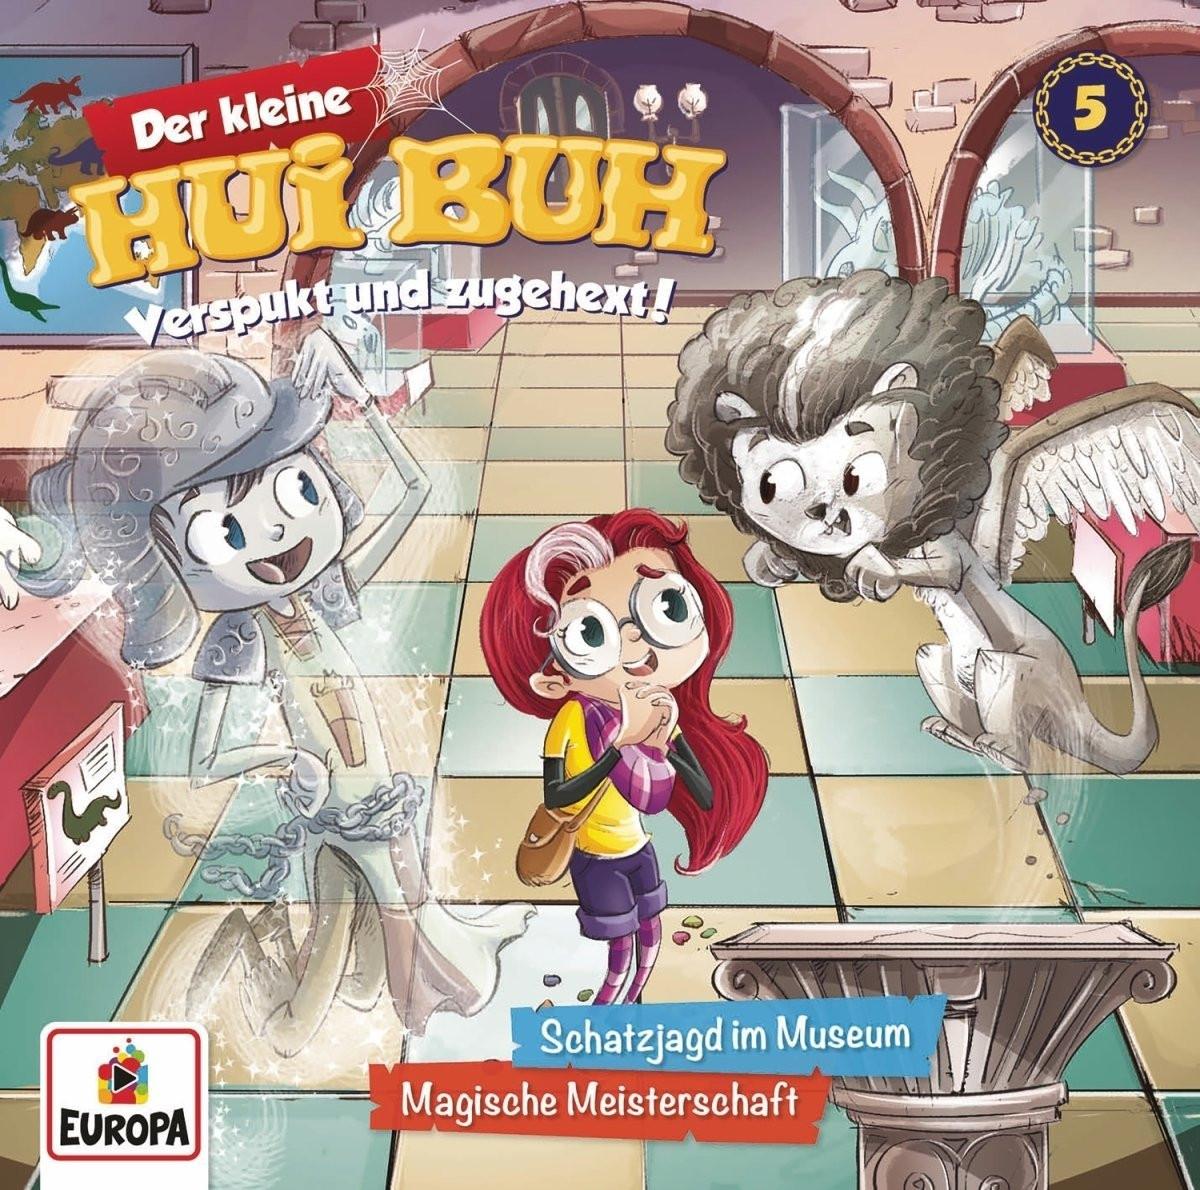 Der kleine HUI BUH - Folge 5: Schatzjagd im Museum / Magische Meisterschaft